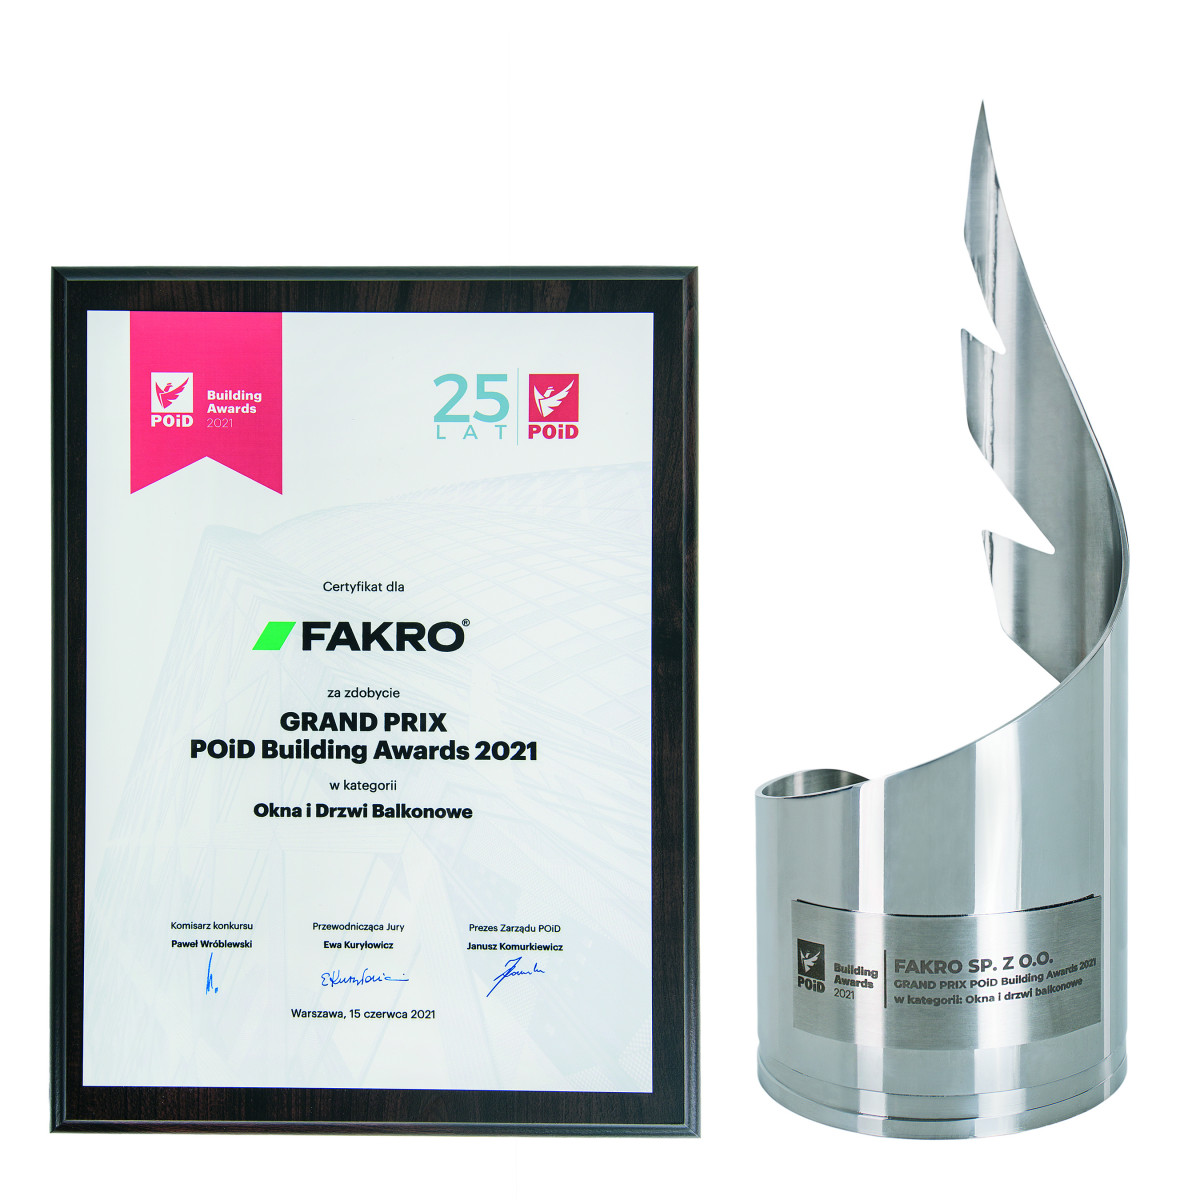 POiD_Building_Awards_2021_03_print